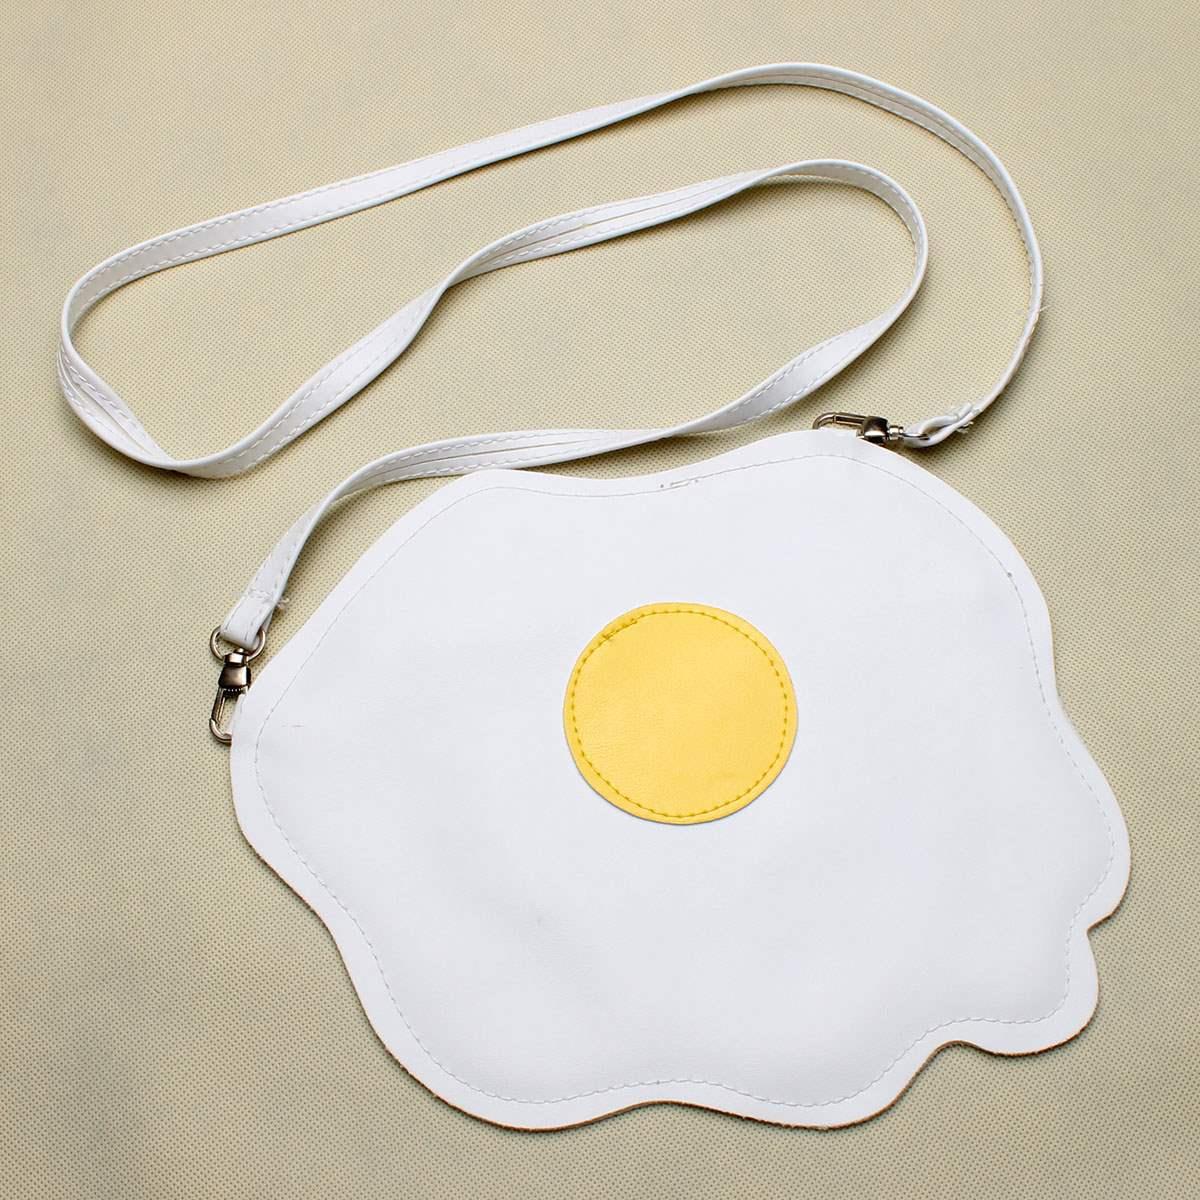 Women Cute Eggs Shoulder Bag Bmelette Shape Bolsa Feminina Fashion Student Gilrs Soft Thin PU Leather Crossbody Messenger Bags<br><br>Aliexpress